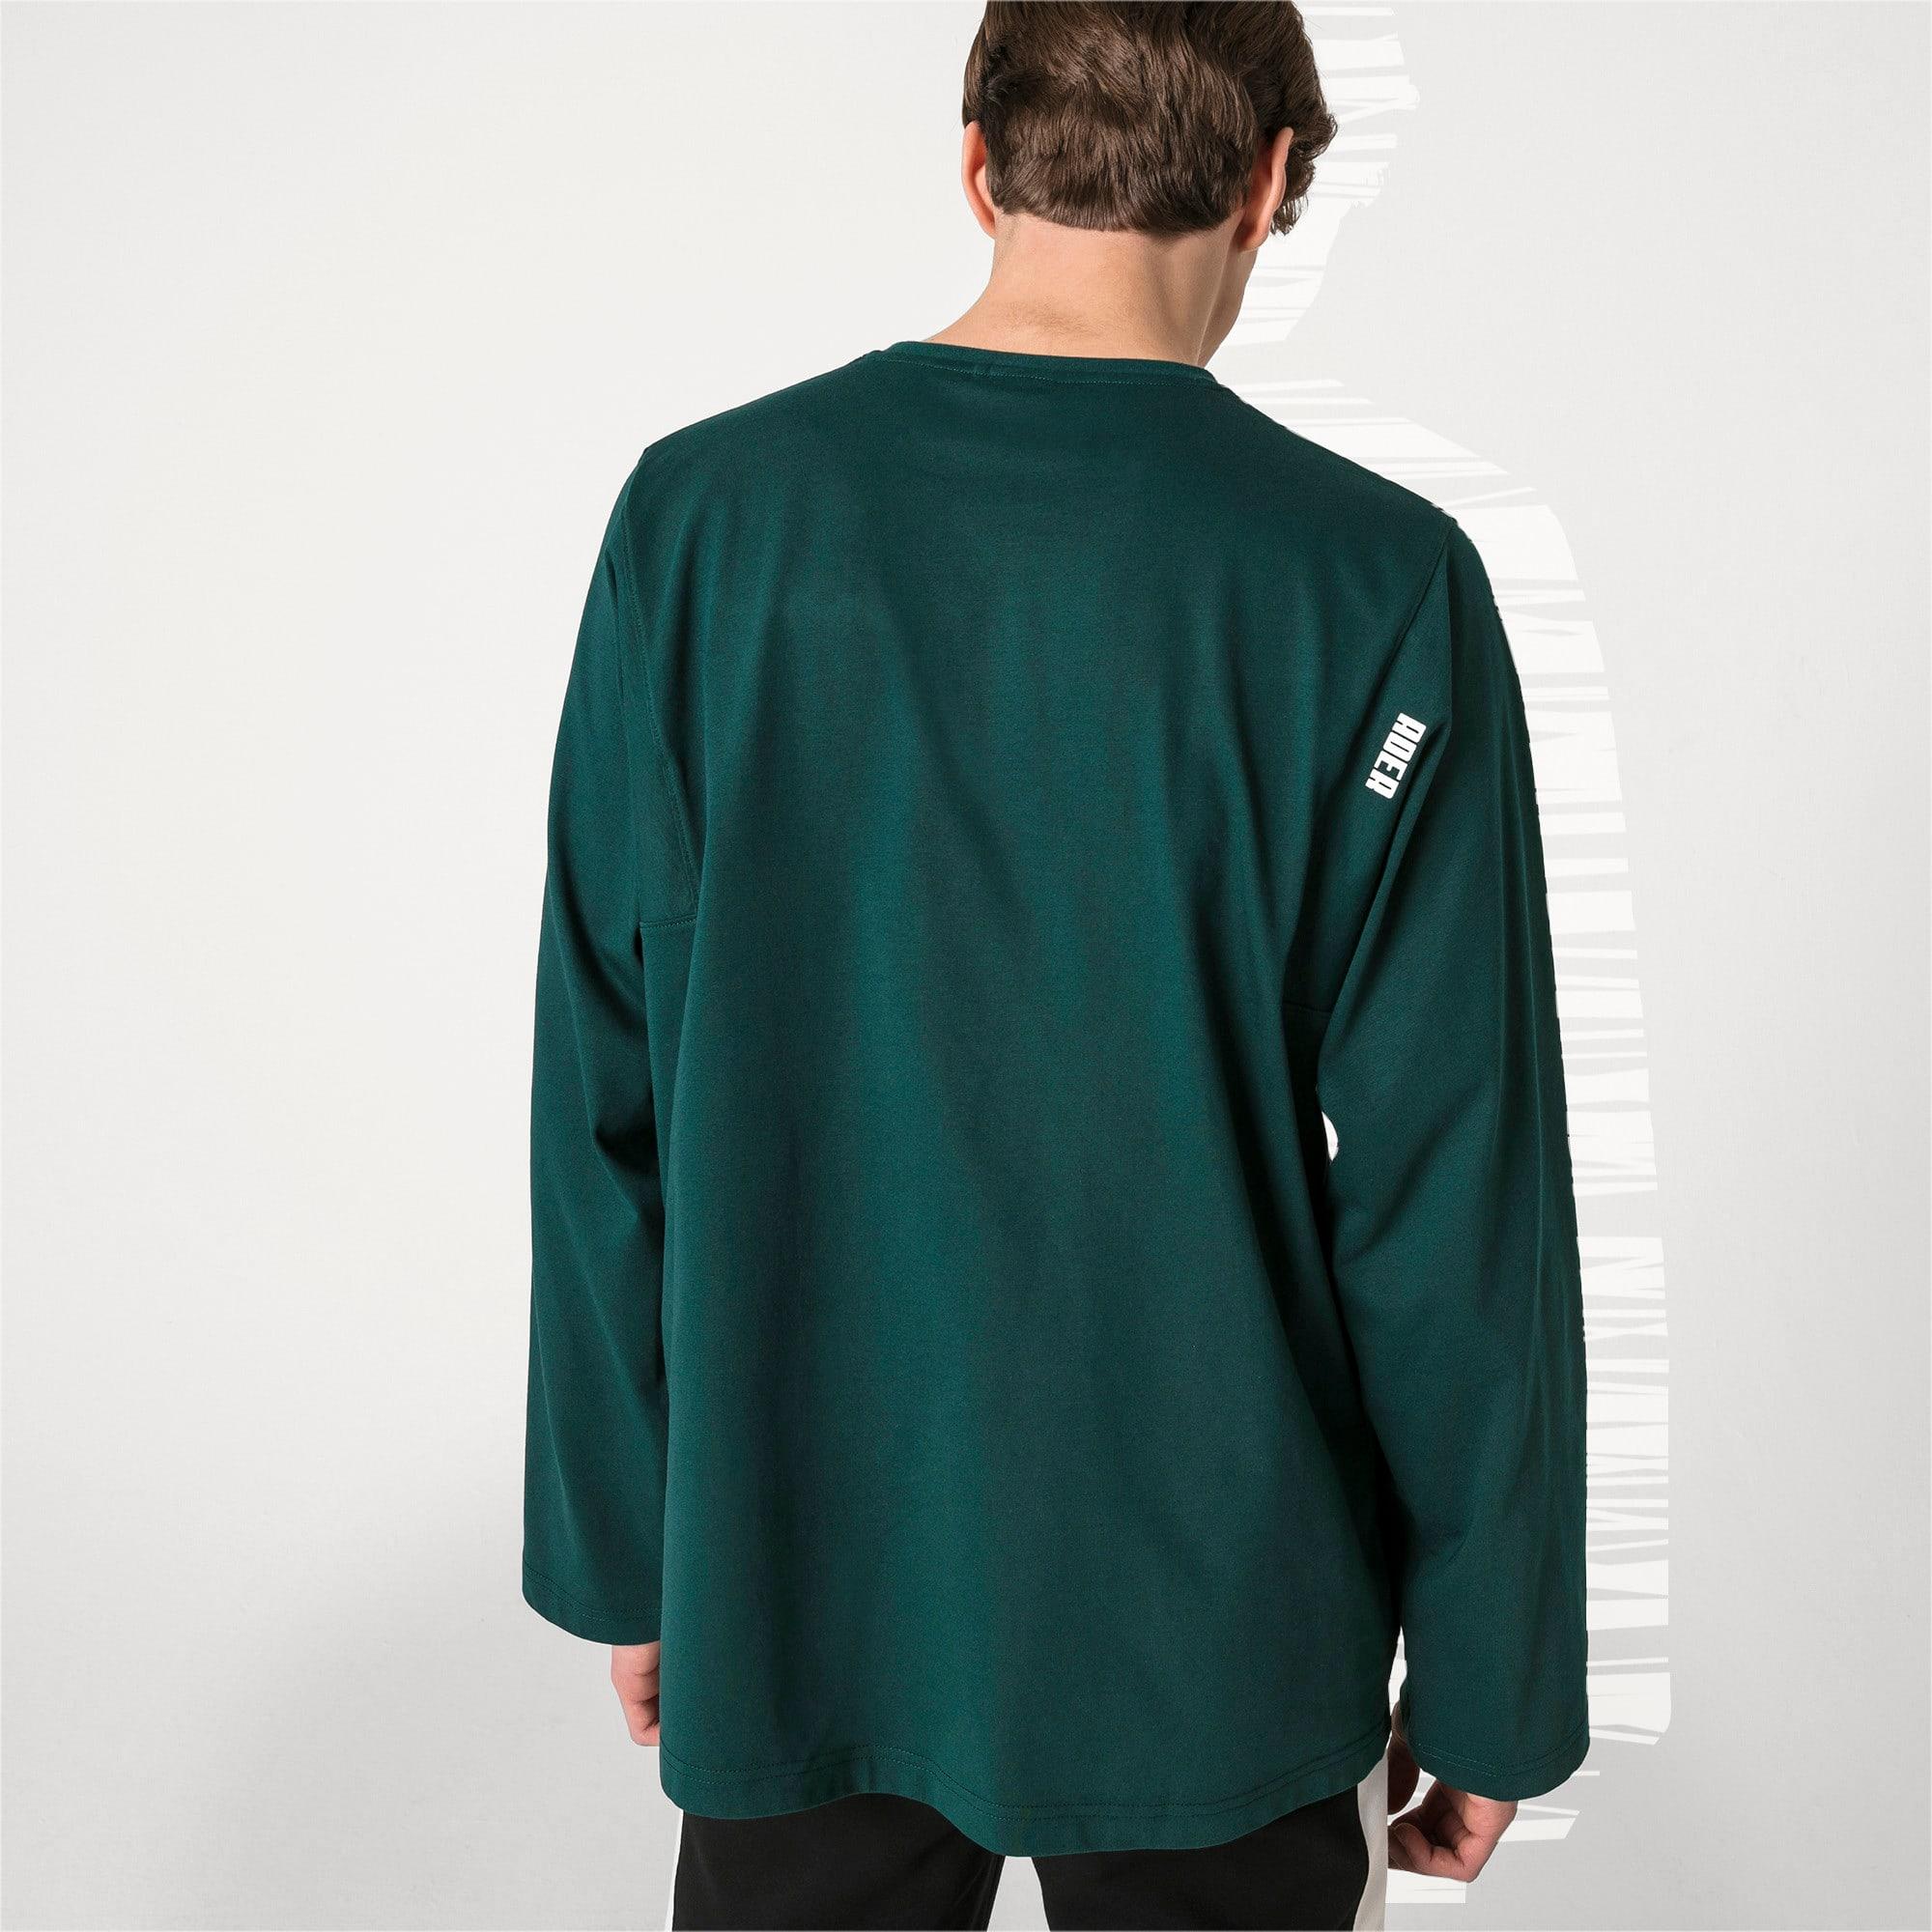 Thumbnail 3 of PUMA x ADER ERROR Langarm-Shirt, Ponderosa Pine, medium